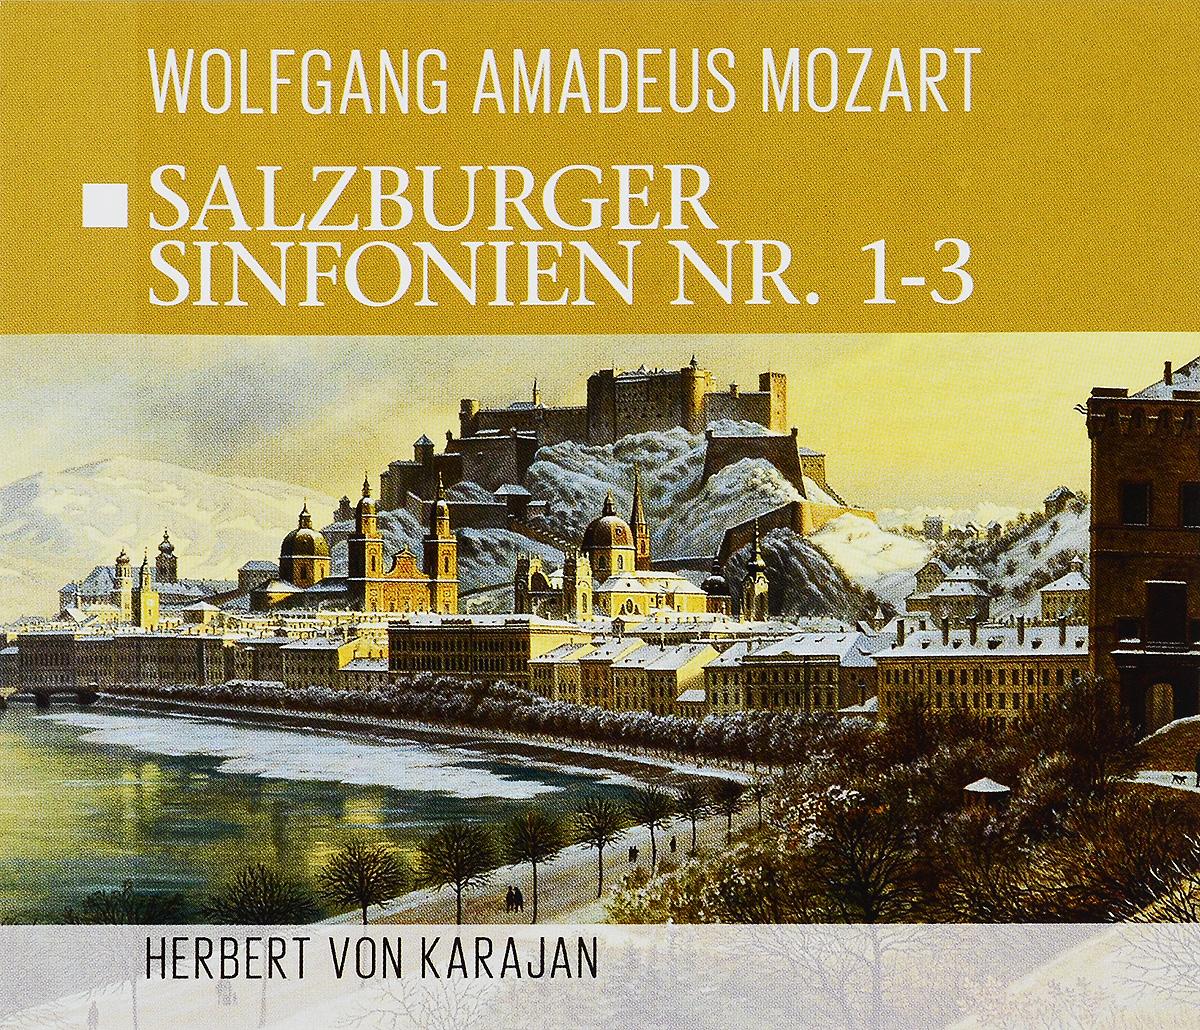 Herbert Von Karajan. Wolfgang Amadeus Mozart. Salzburger Sinfonien Nr. 1-3 mozart s music of friends